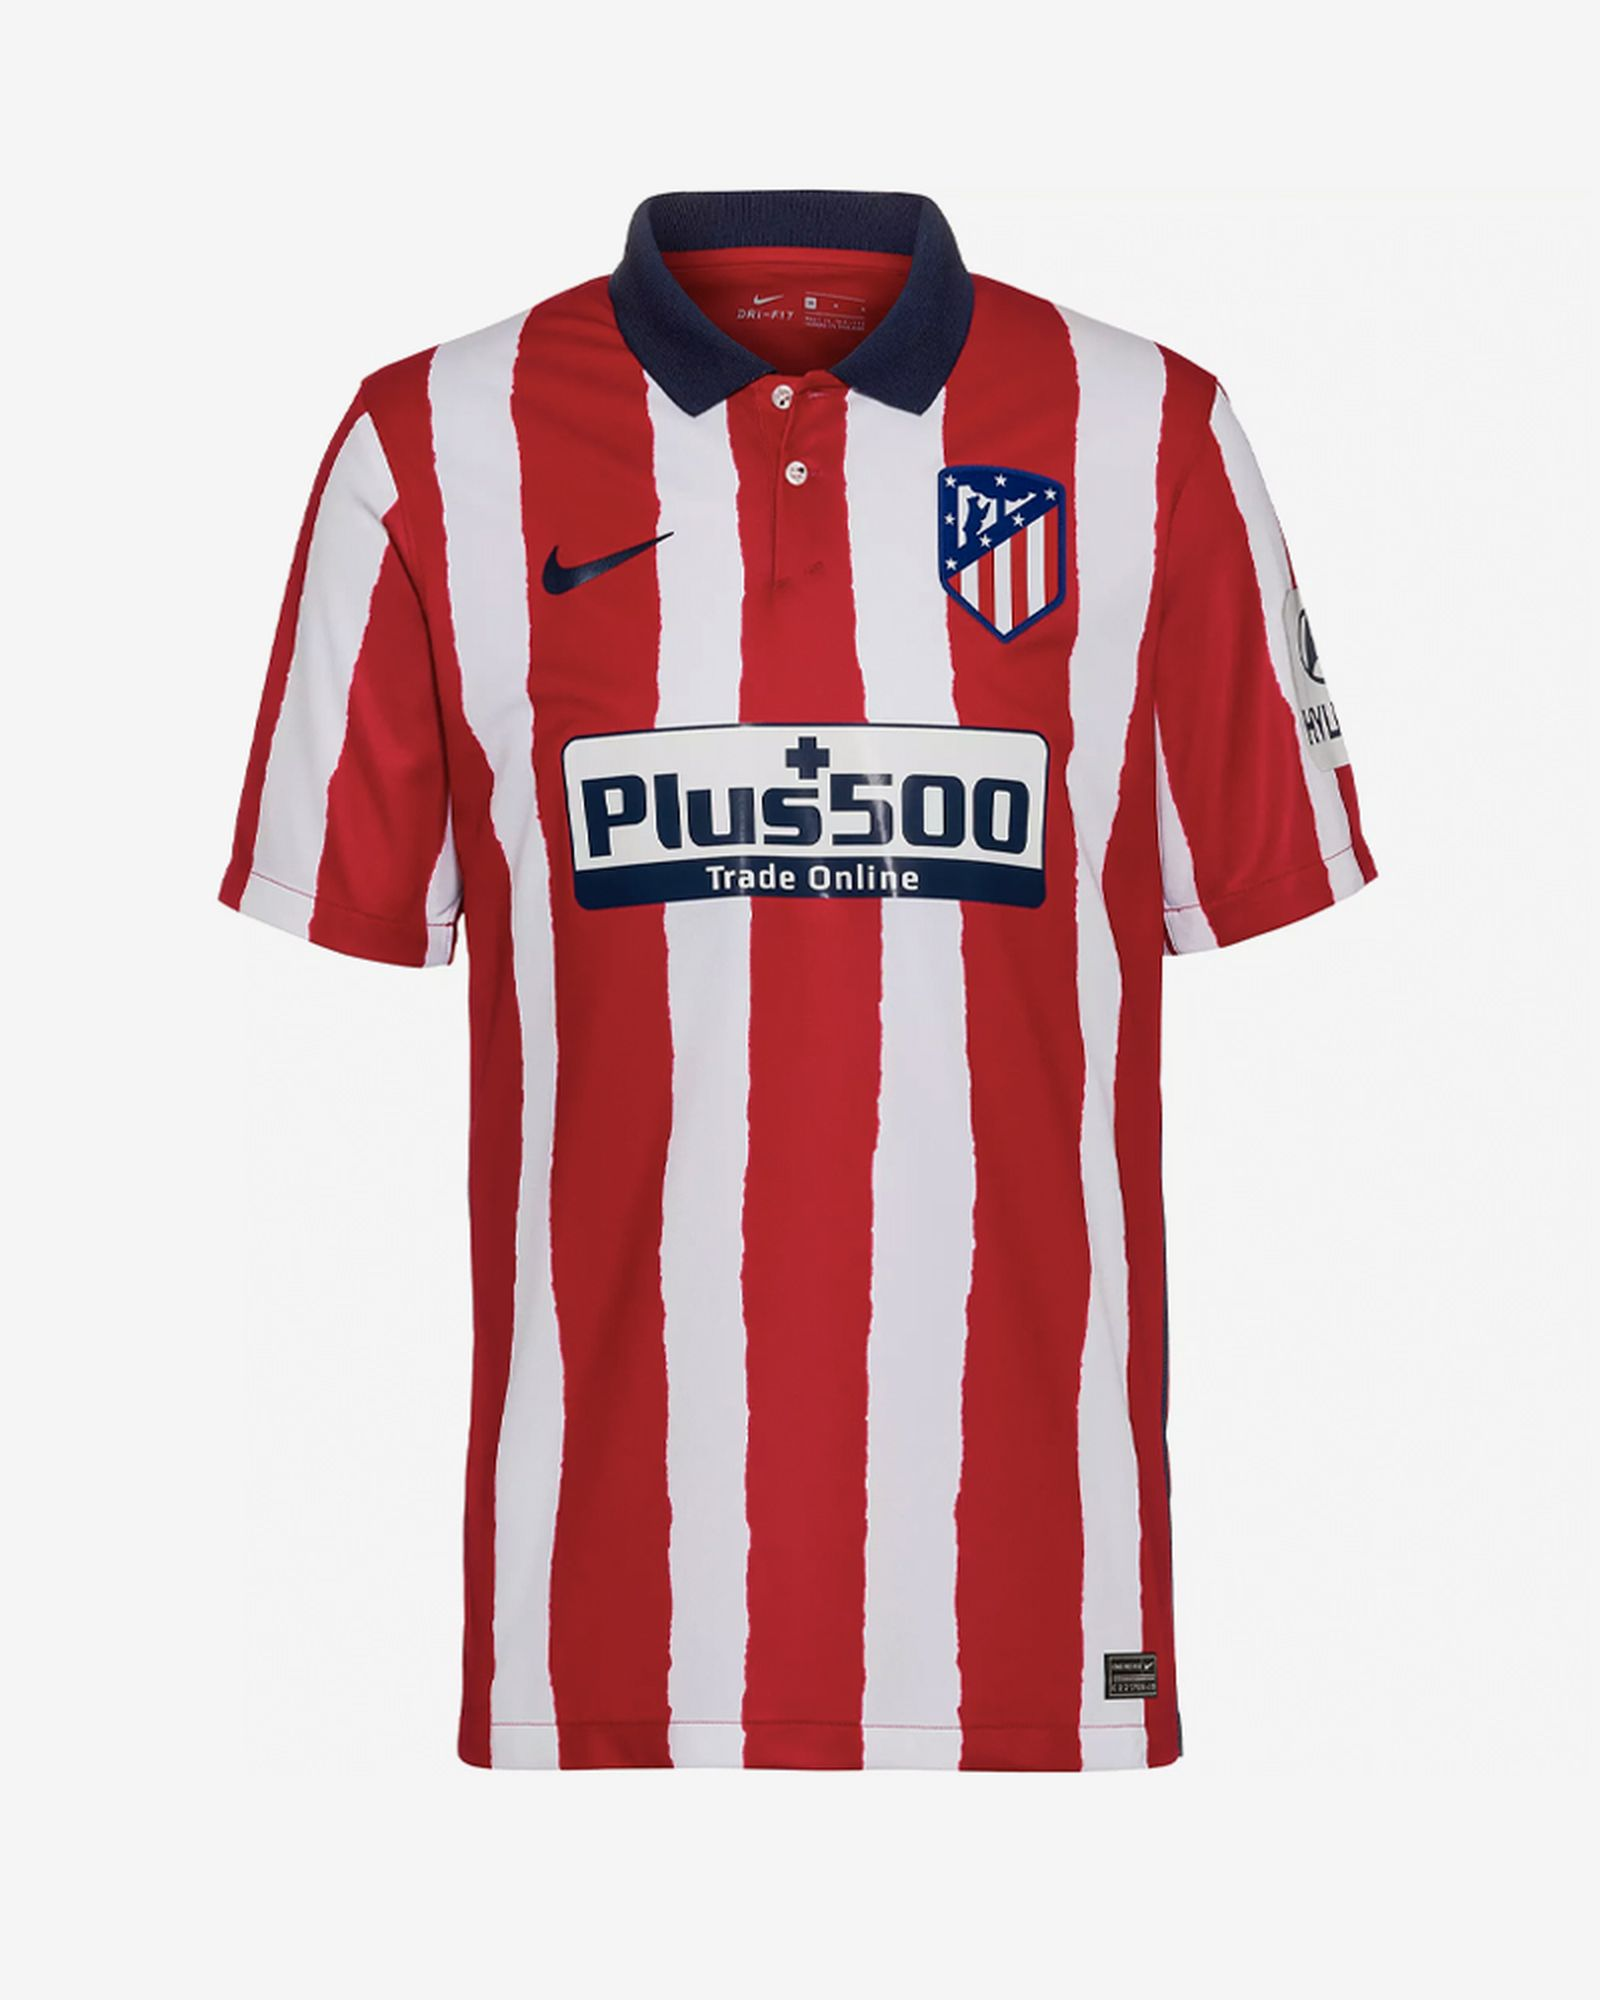 football-shirts-2020-review-12